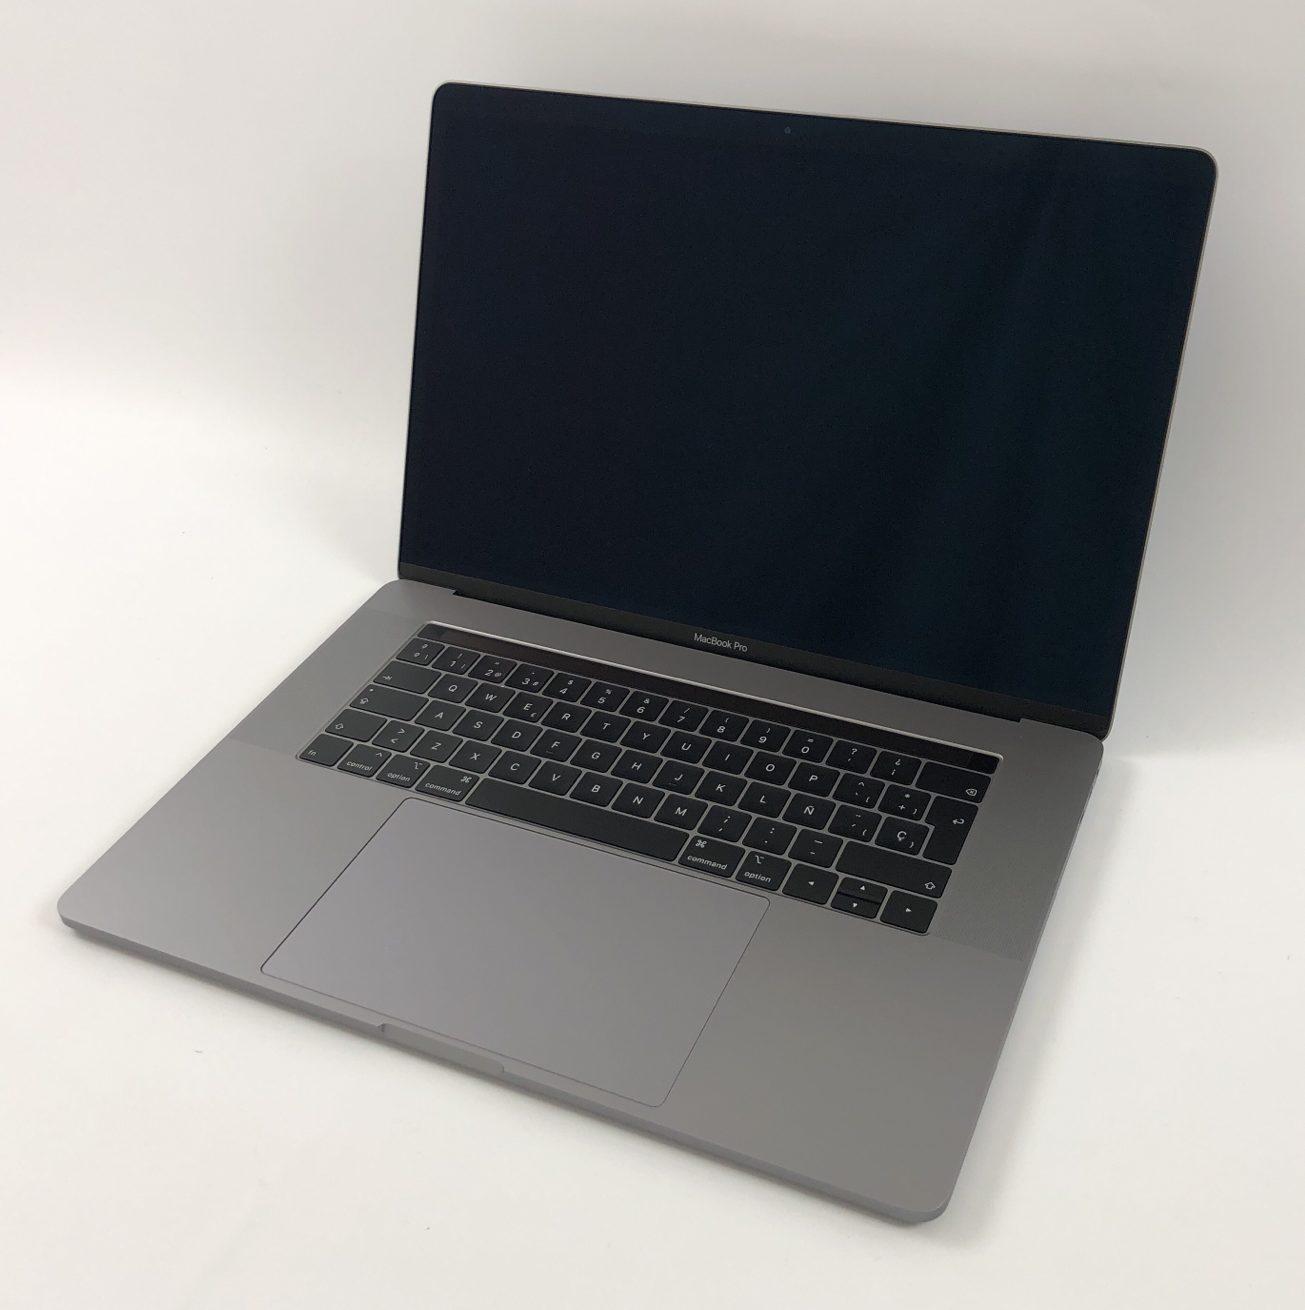 "MacBook Pro 15"" Touch Bar Mid 2018 (Intel 6-Core i7 2.6 GHz 16 GB RAM 512 GB SSD), Space Gray, Intel 6-Core i7 2.6 GHz, 16 GB RAM, 512 GB SSD, imagen 1"